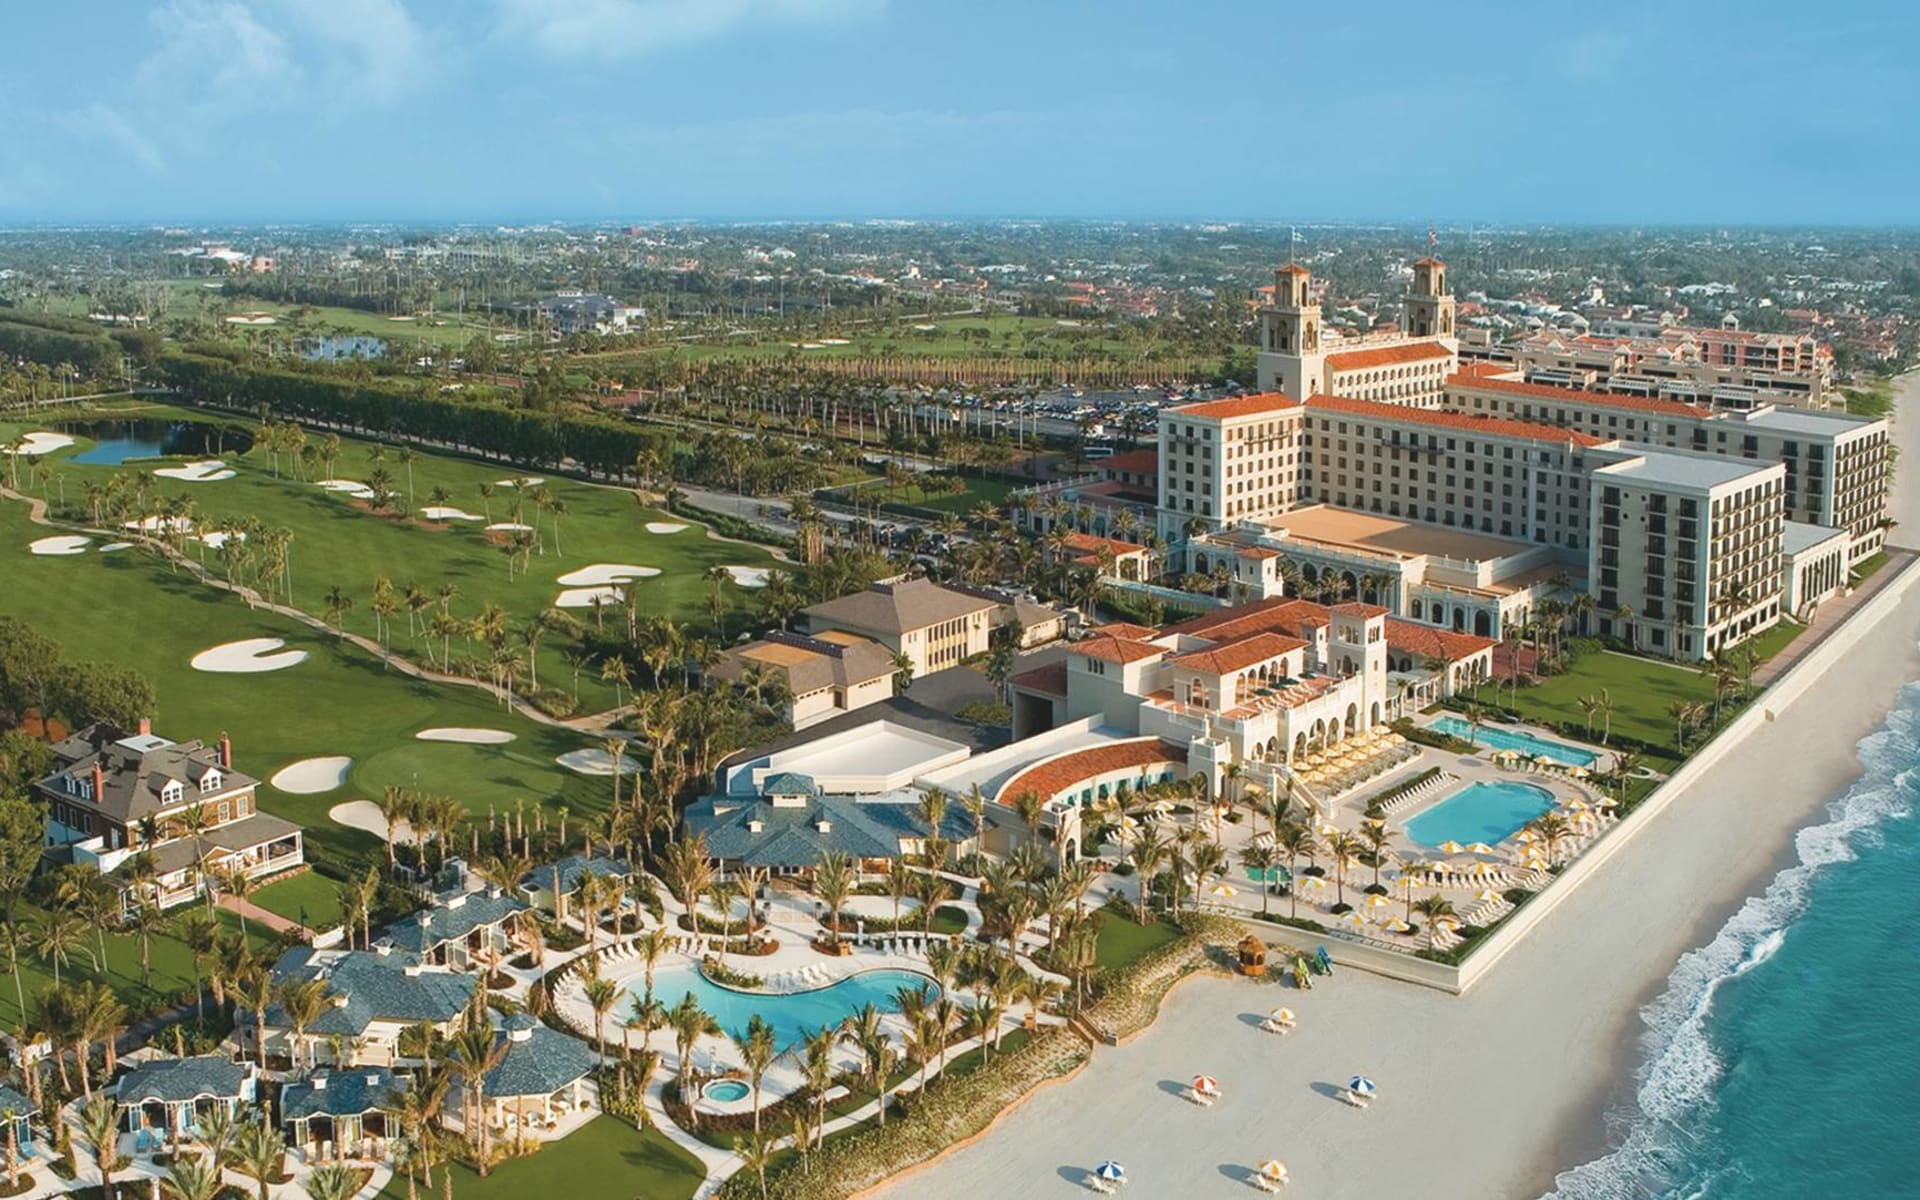 Florida Deluxe ab Miami: Aussenansicht